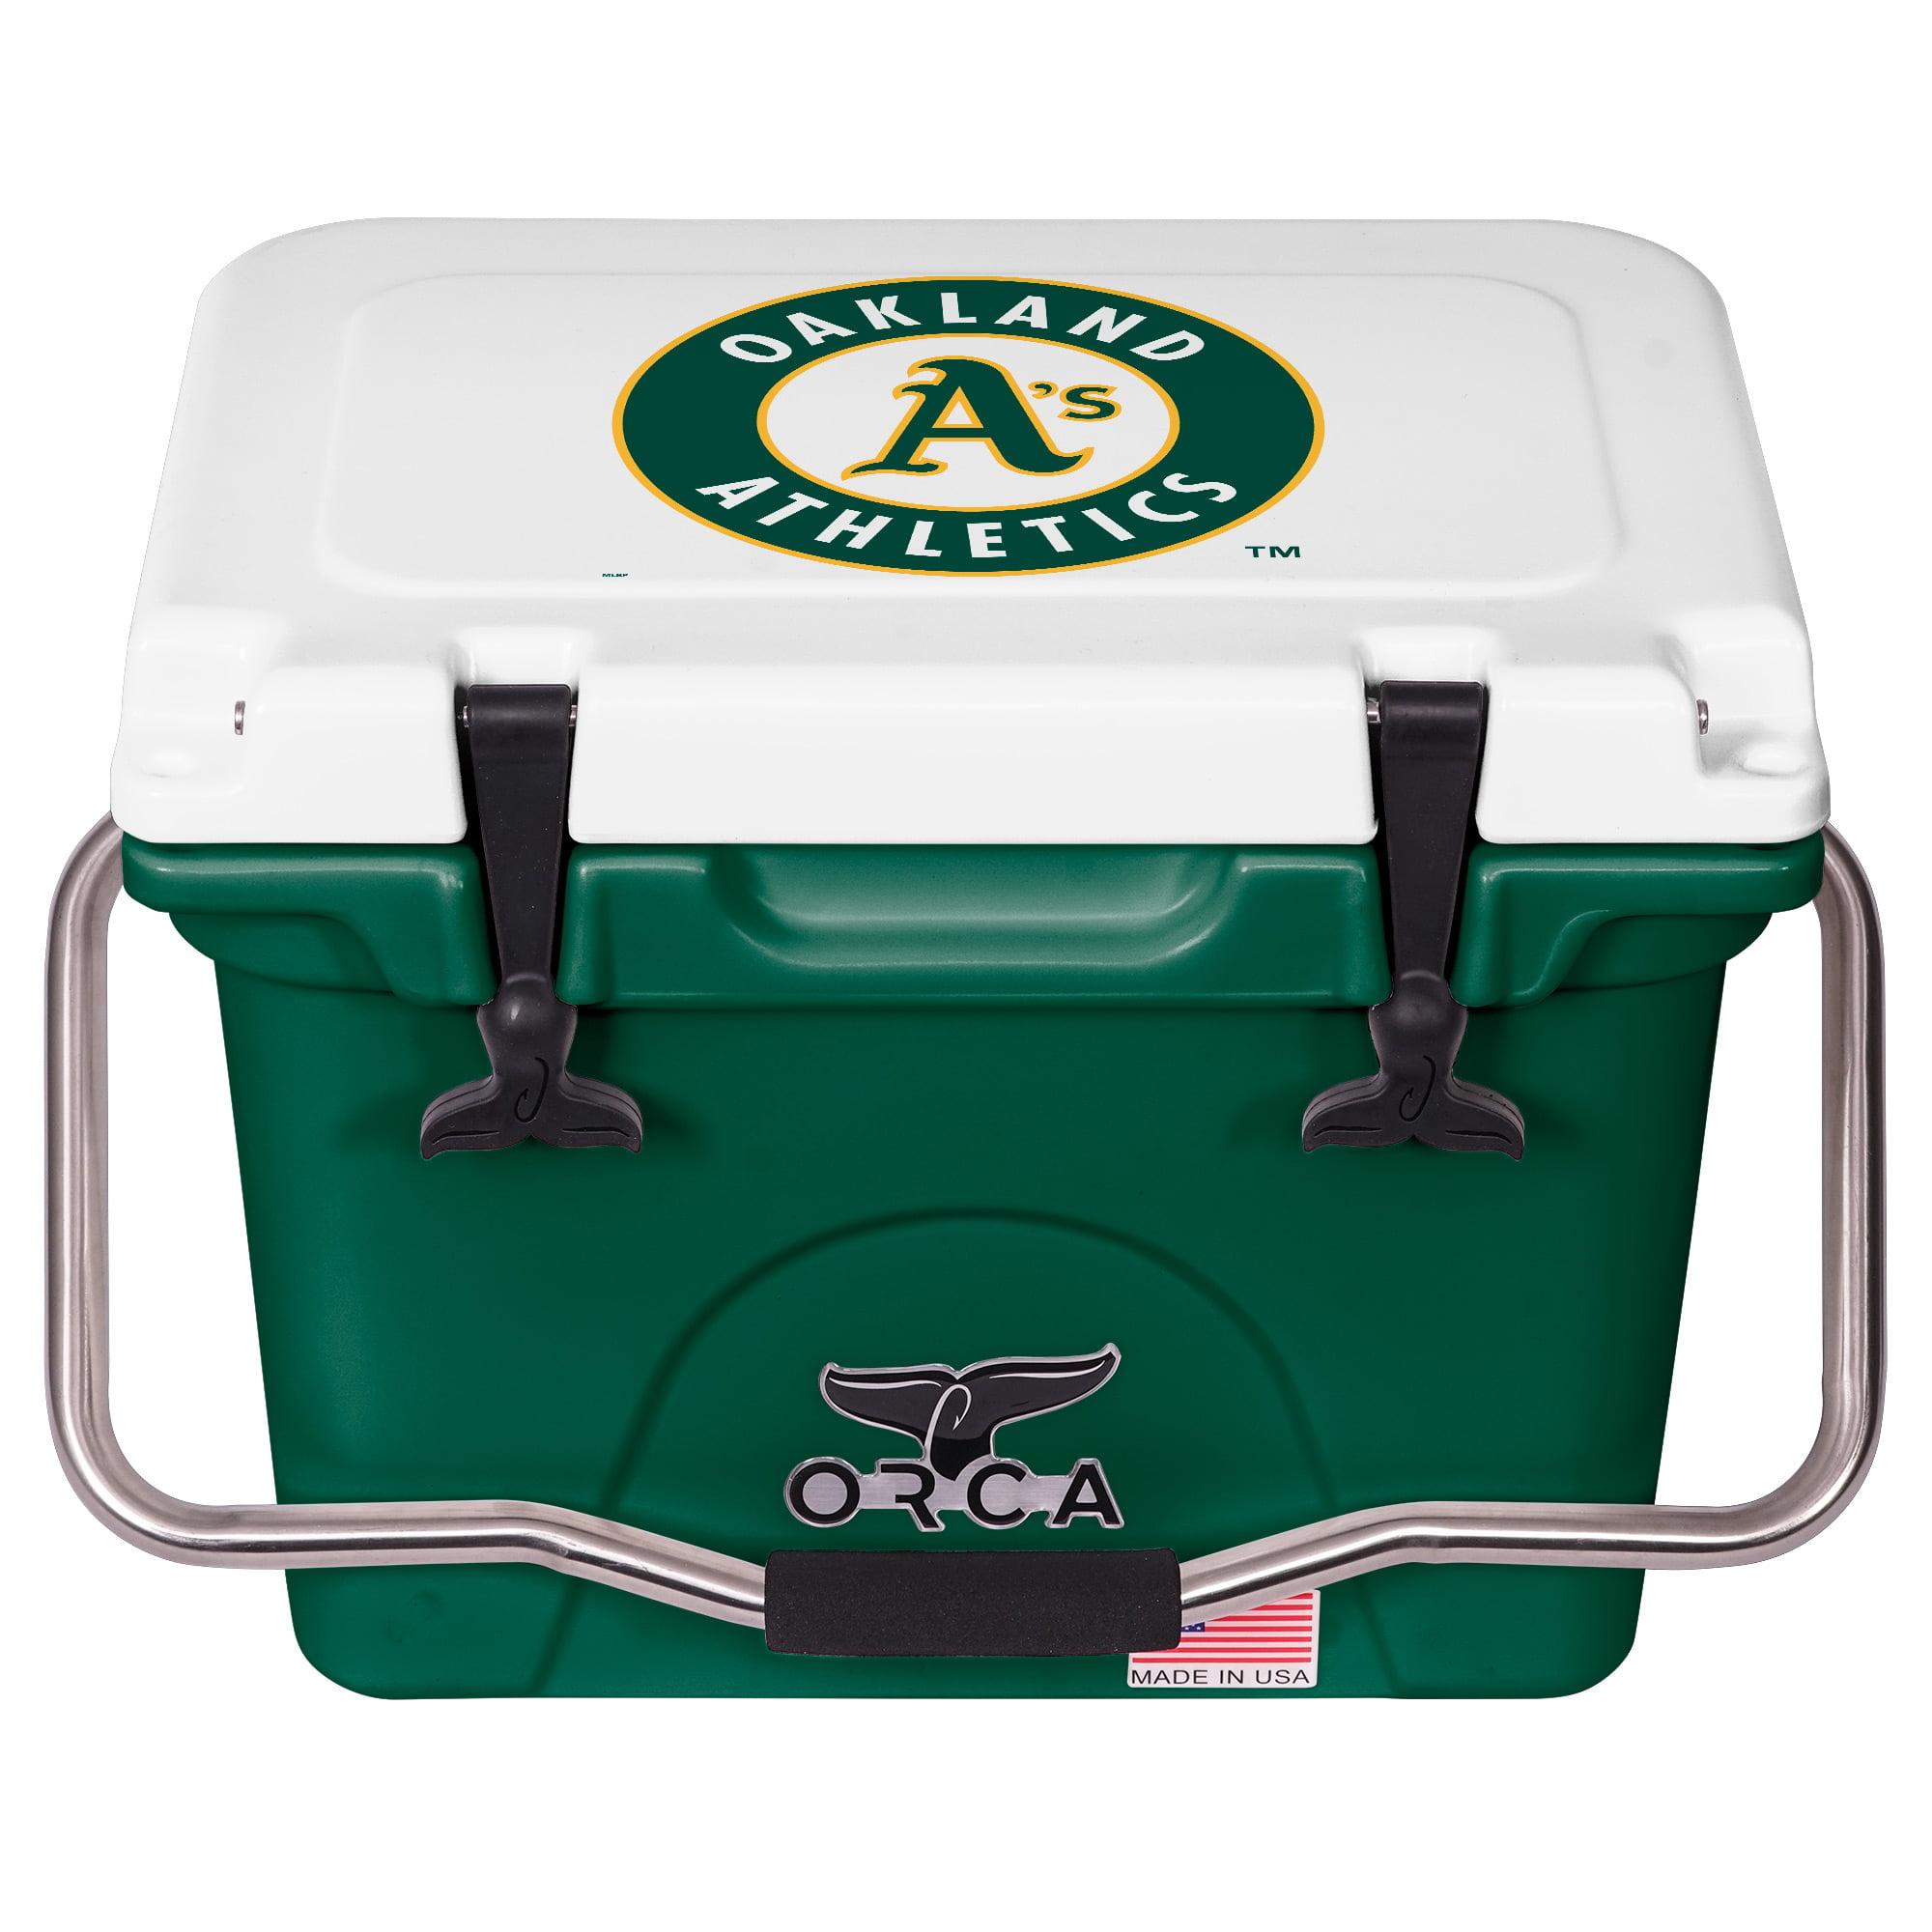 Oakland Athletics ORCA 20-Quart Hard-Sided Cooler - No Size